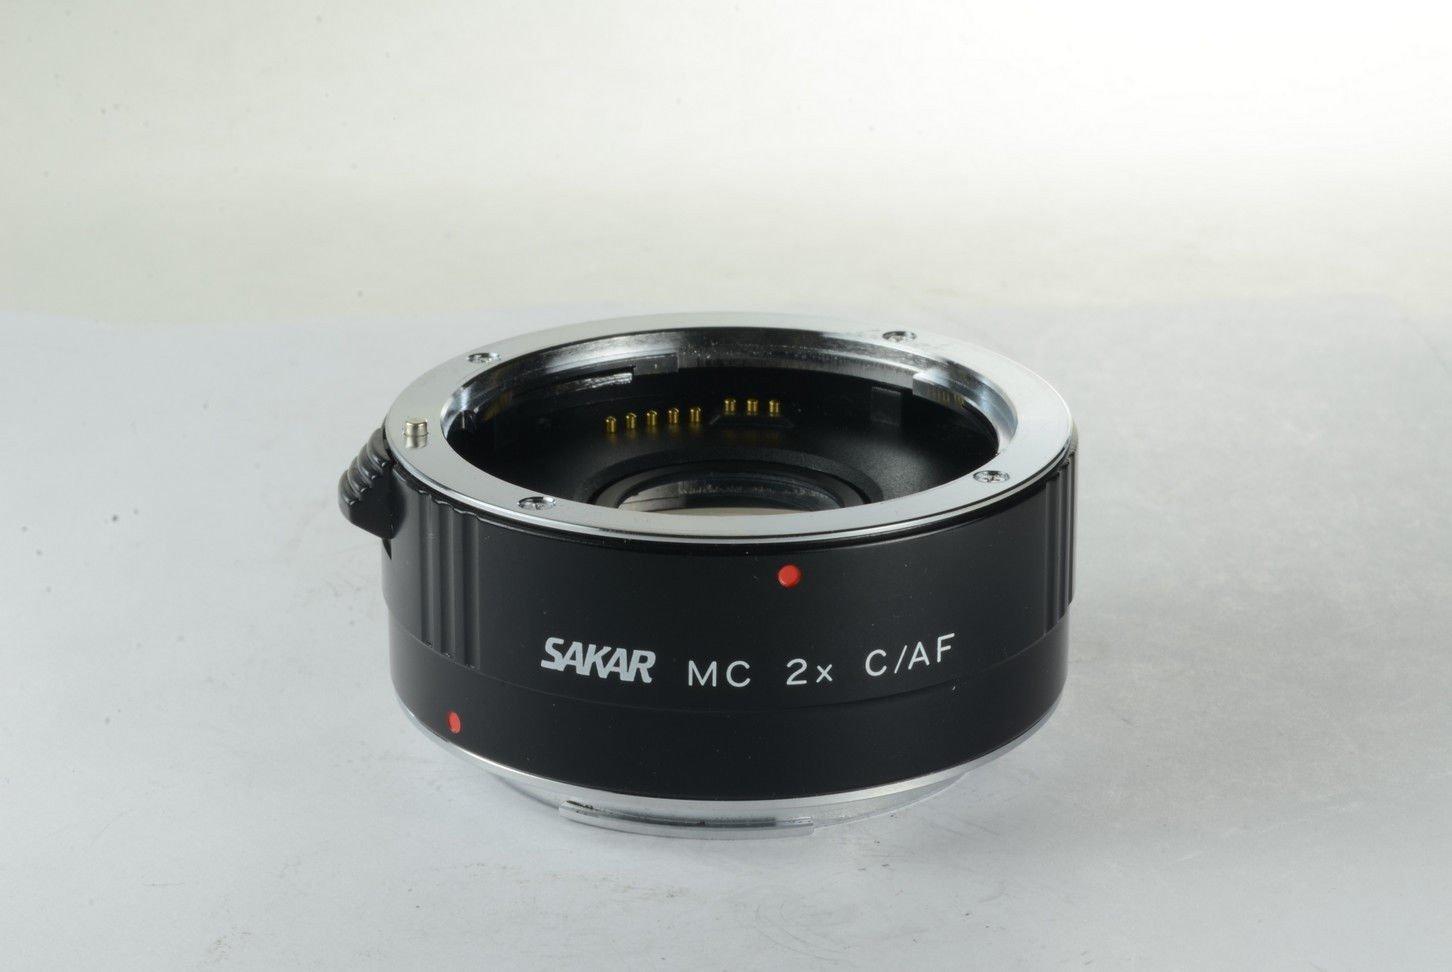 2x AutoFocus Tele Converter Doubler for CANON EOS lenses